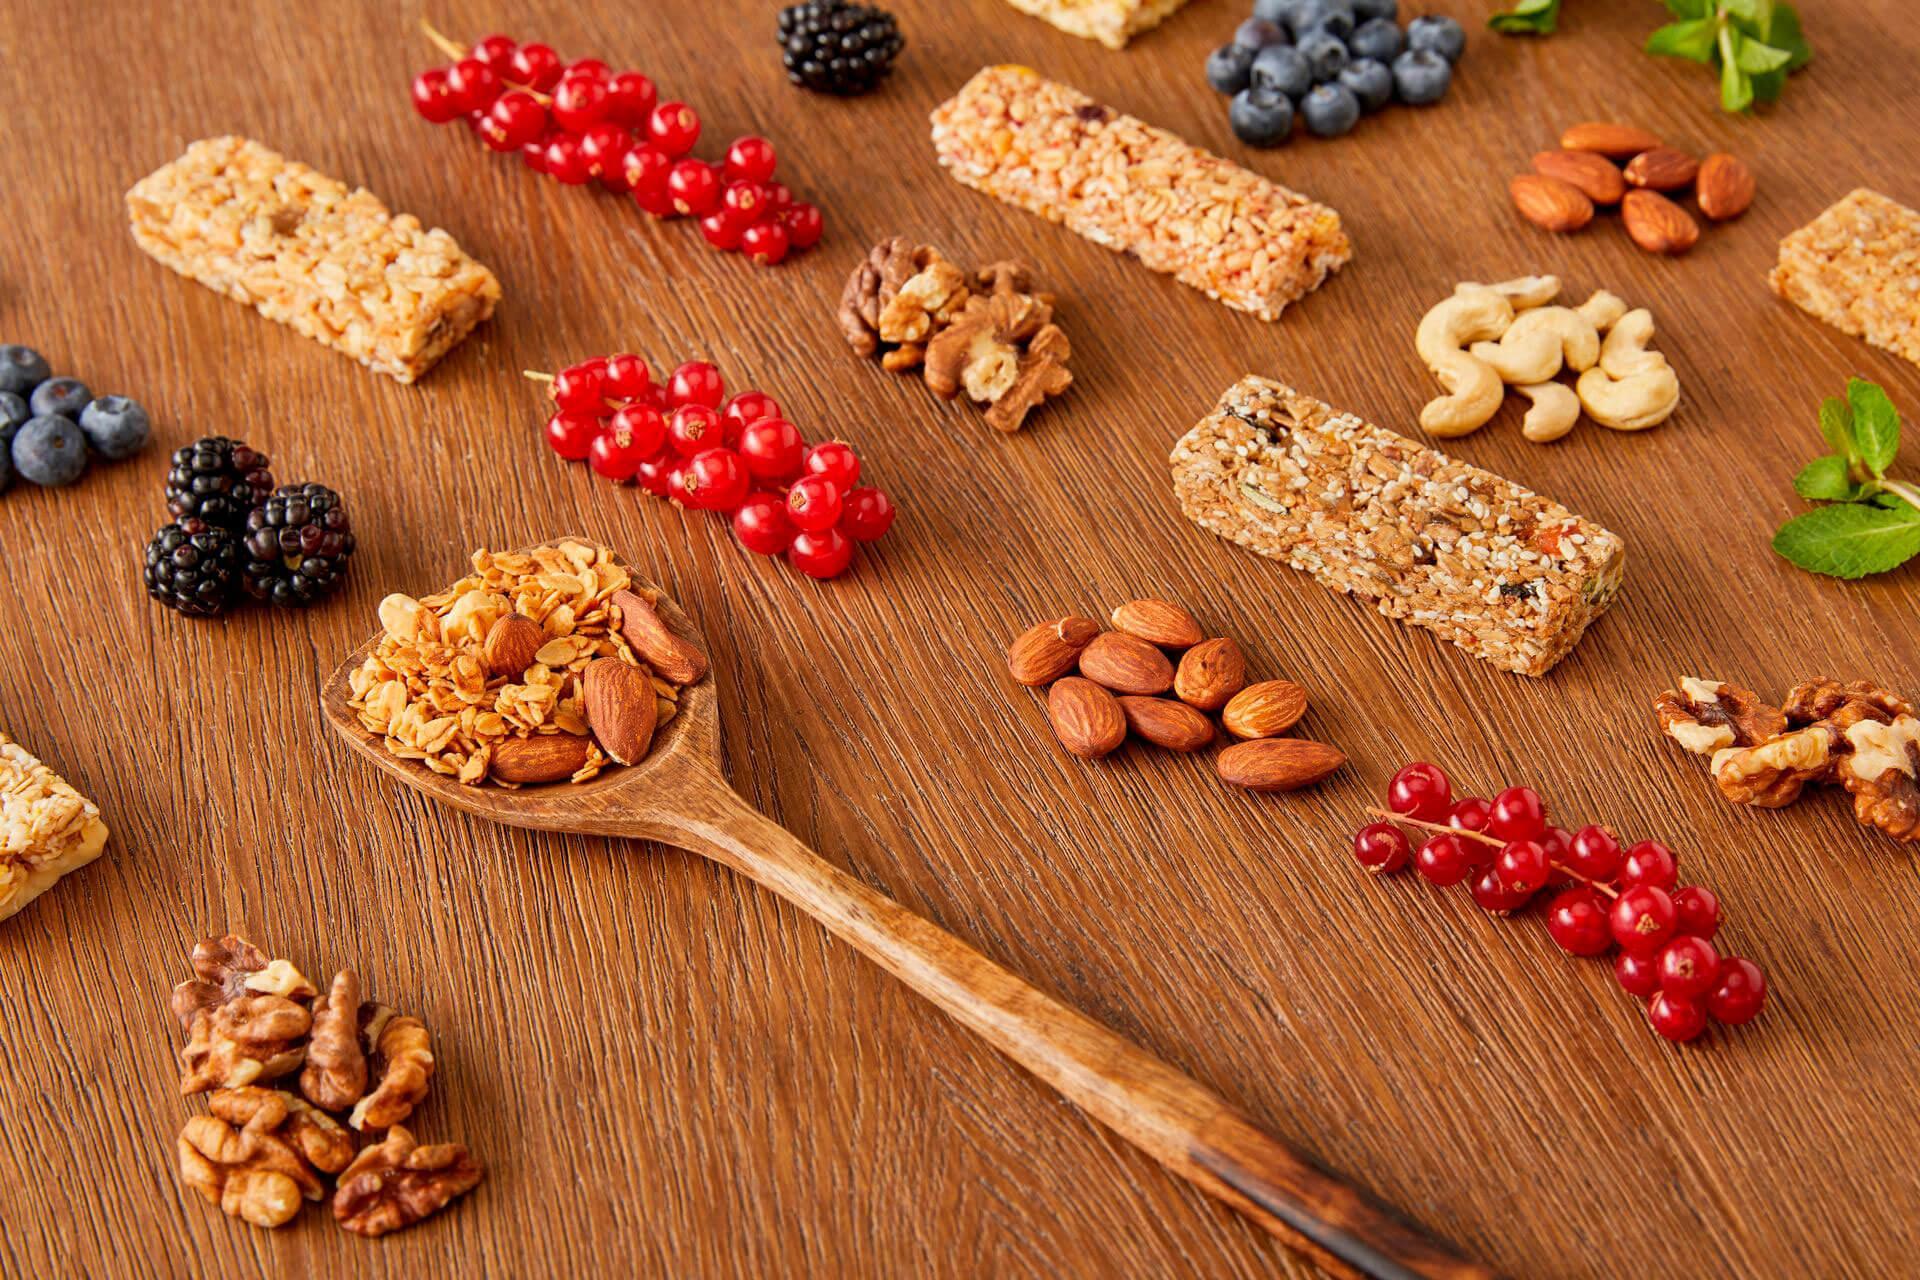 Homemade healthy snack - granola vegan protein bars